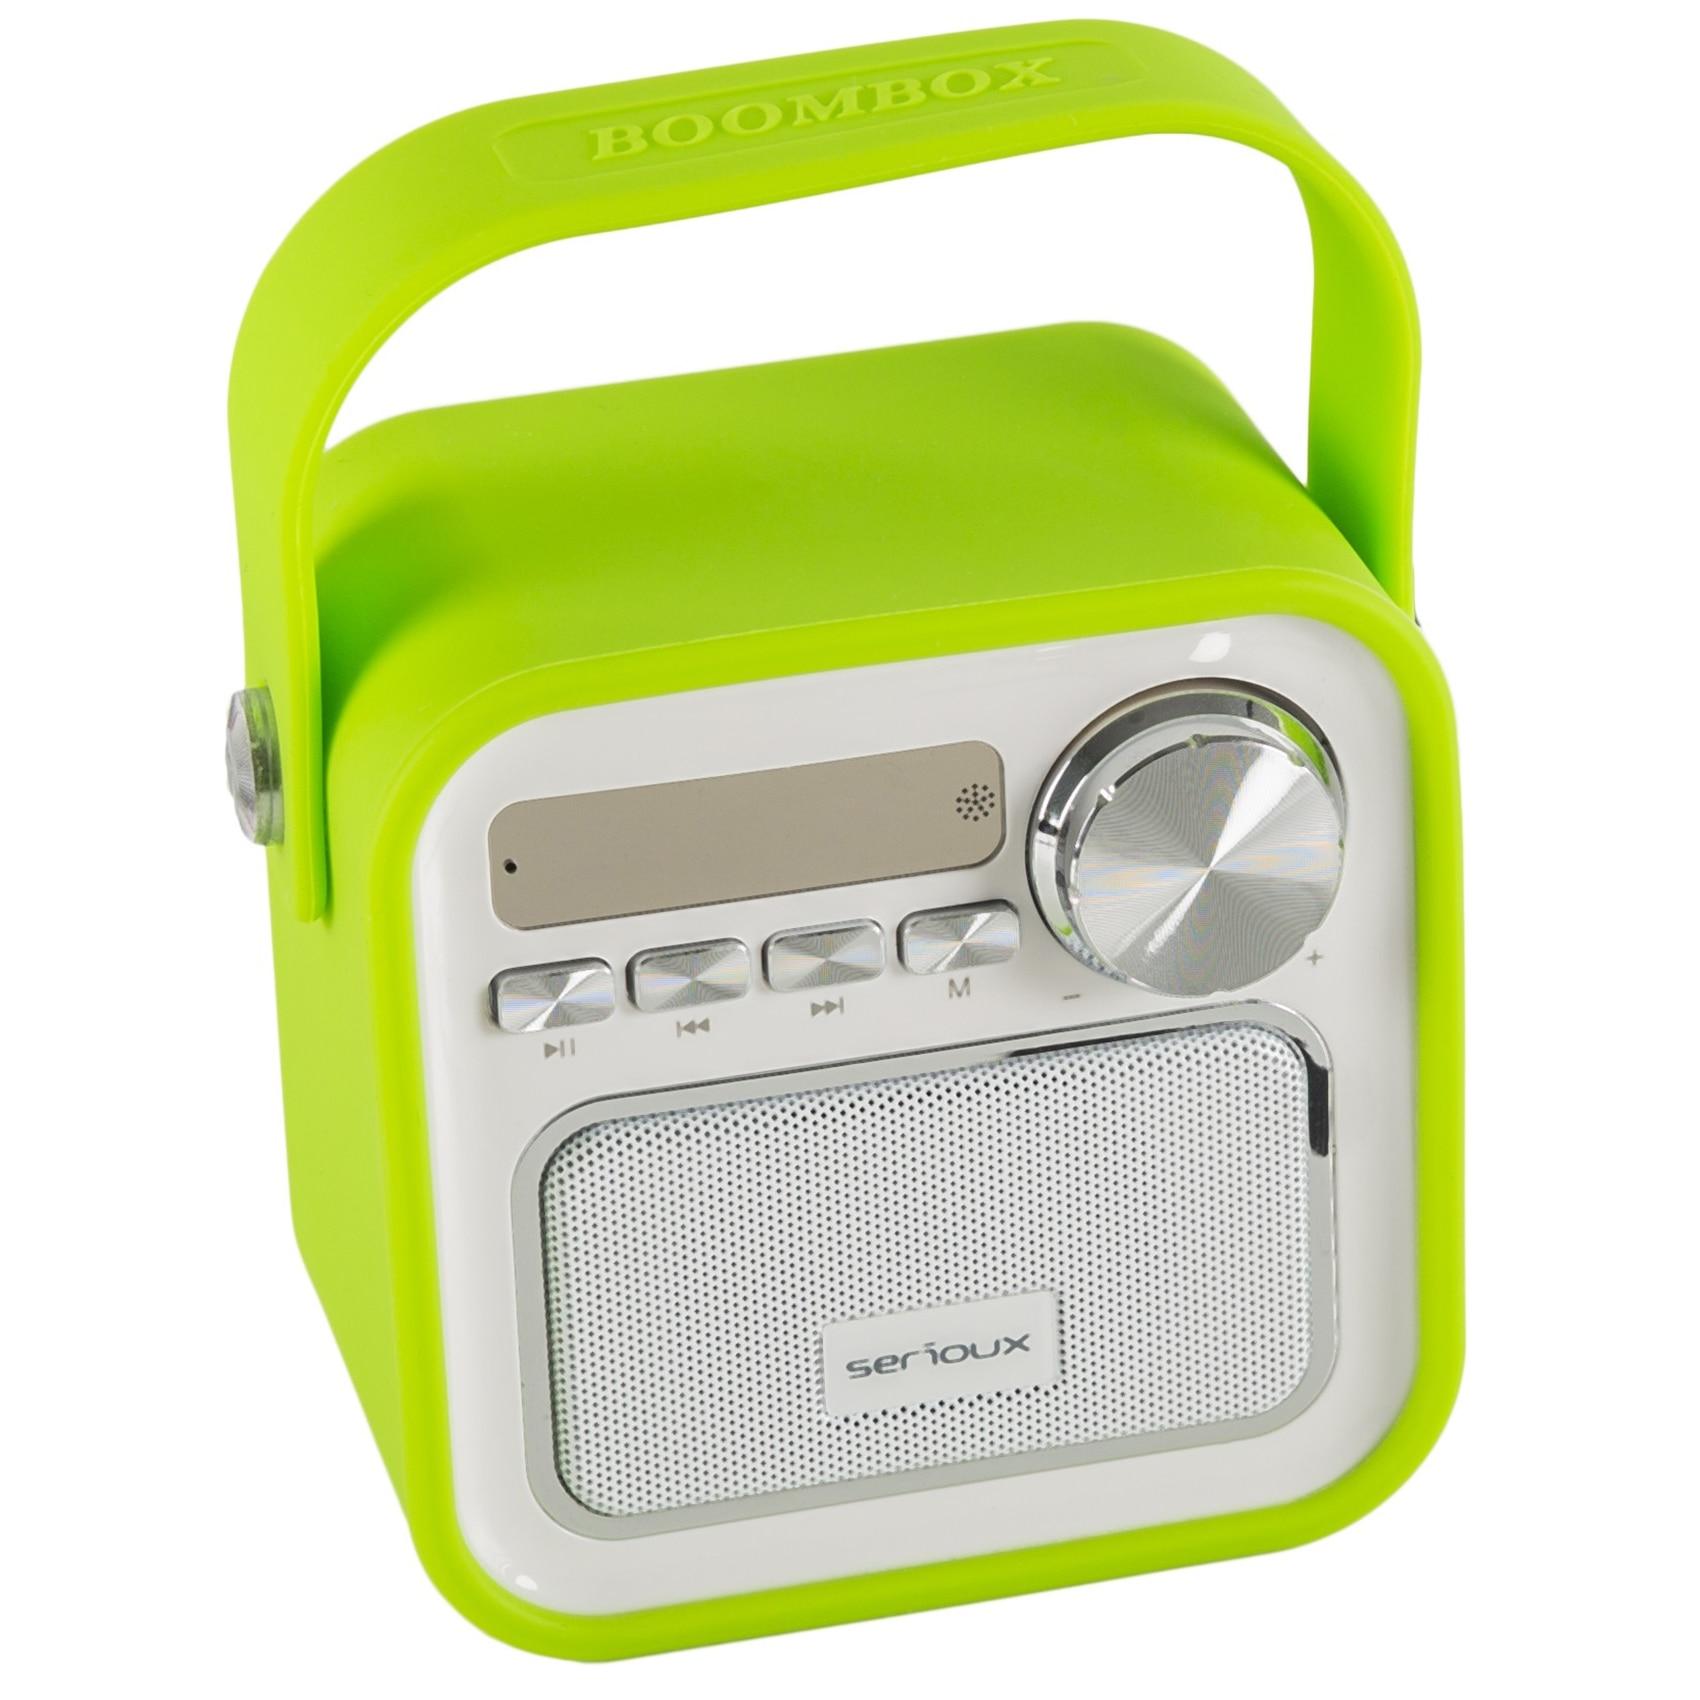 Fotografie Boxa portabila Serioux Joy, Bluetooth, Radio FM, miscroSD, Verde